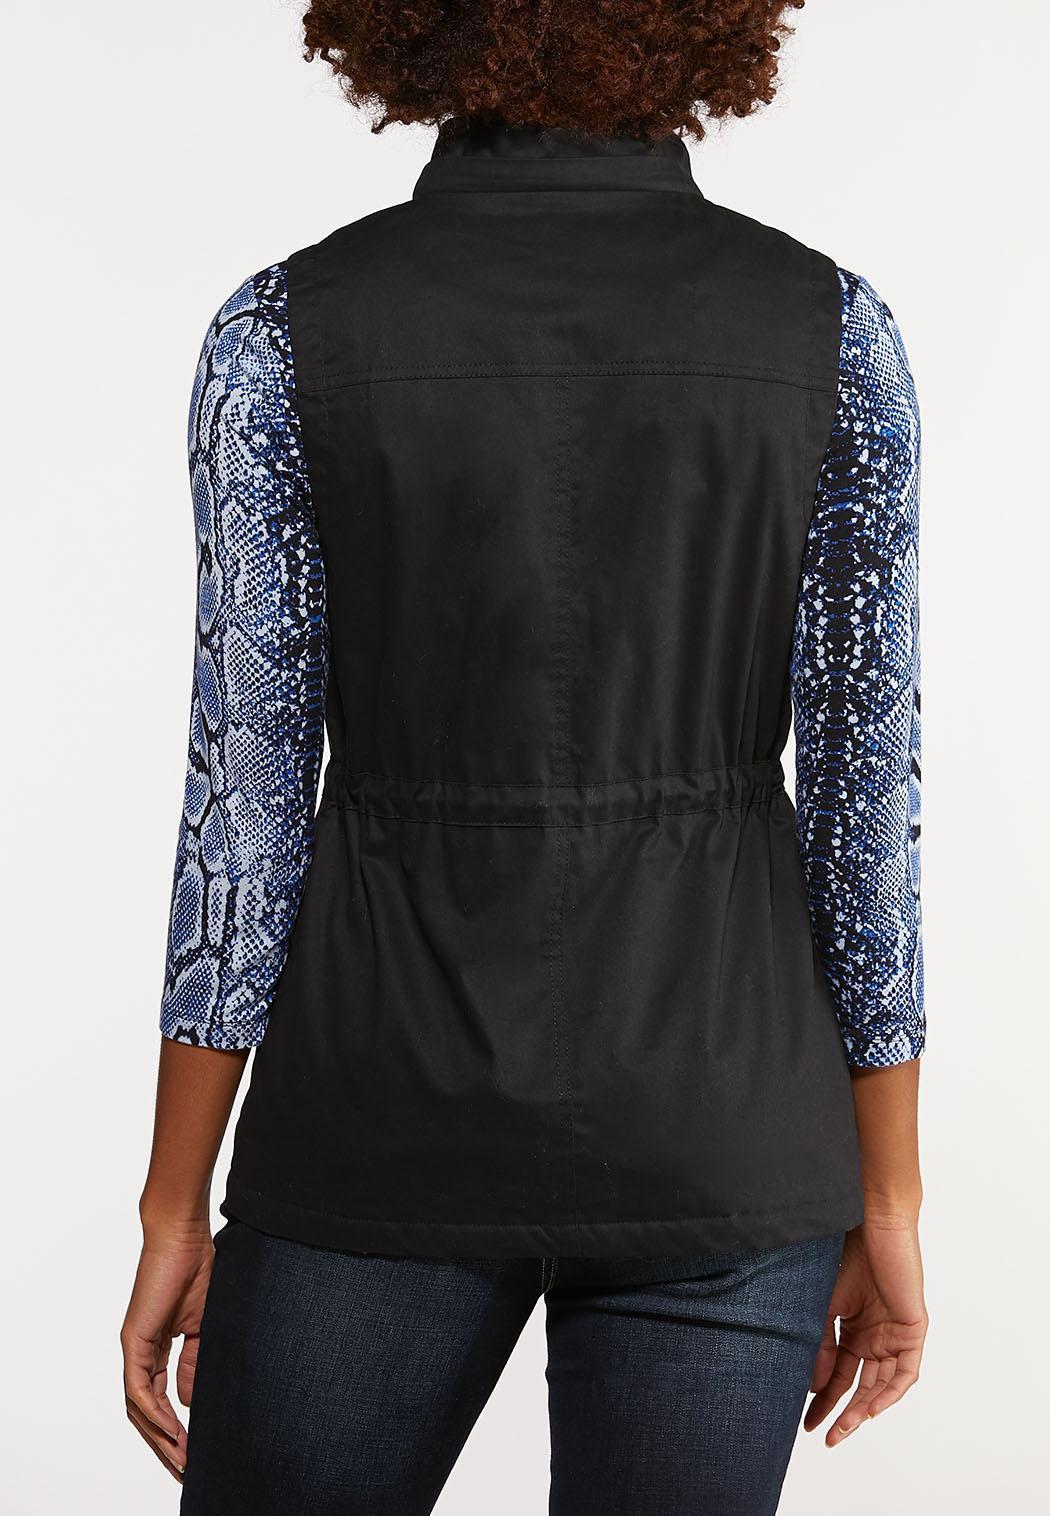 Plus Size Sherpa Lined Utility Vest (Item #44043961)